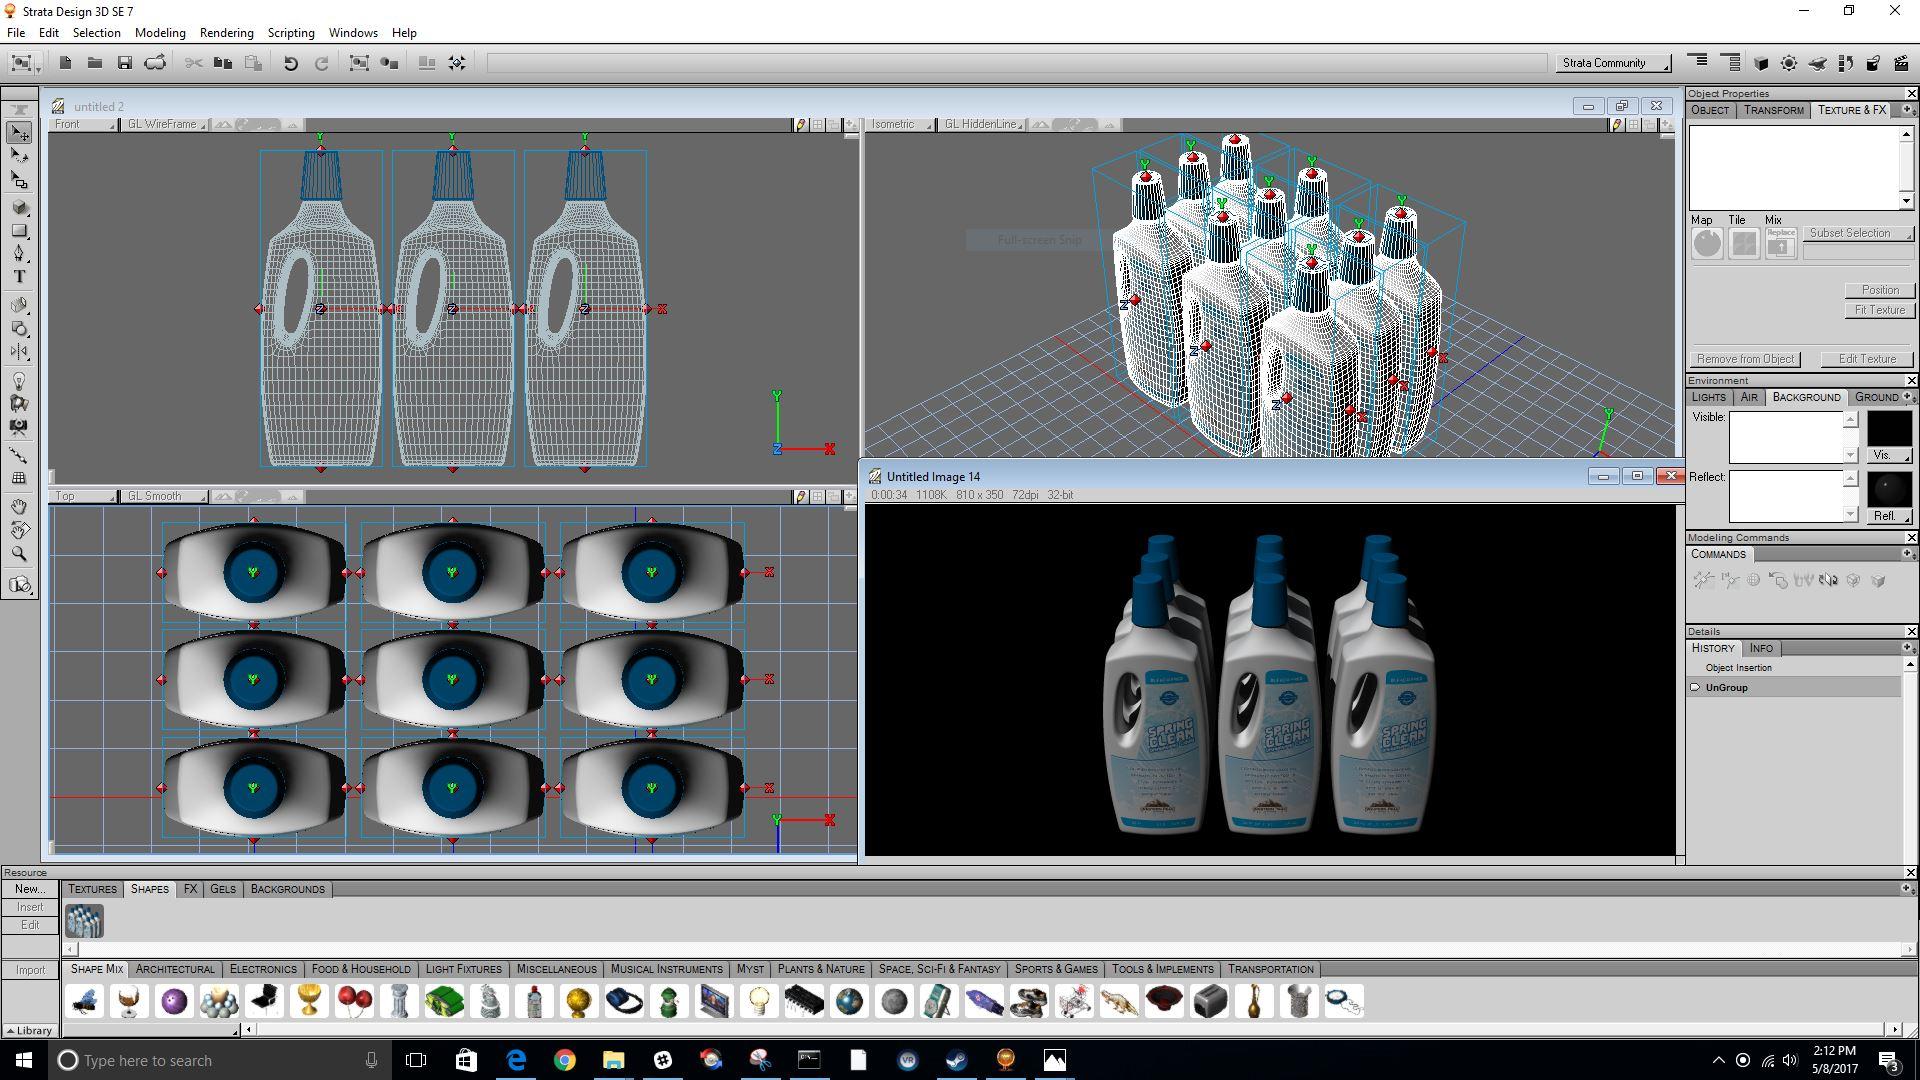 Strata Design 3D SE on Steam